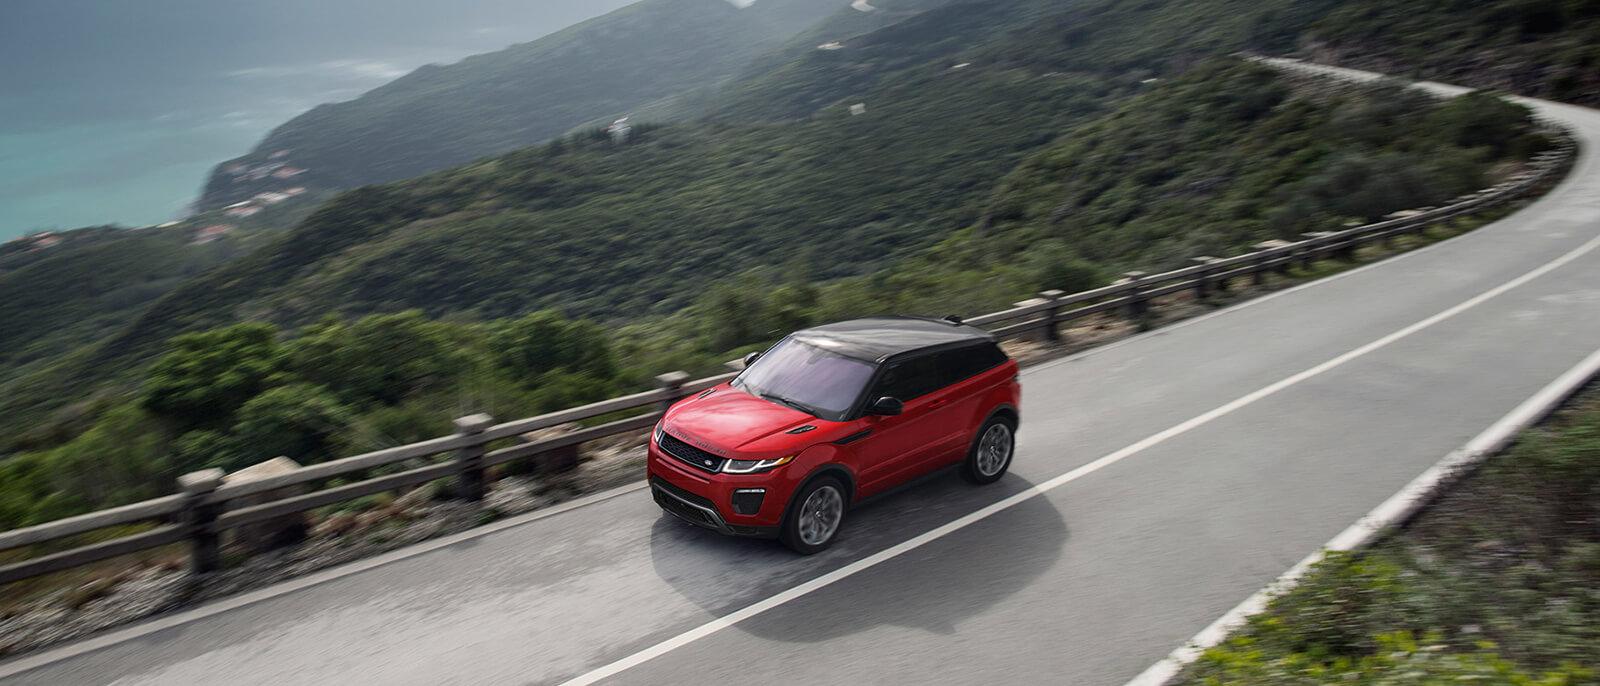 2017 Range Rover Evoque driving